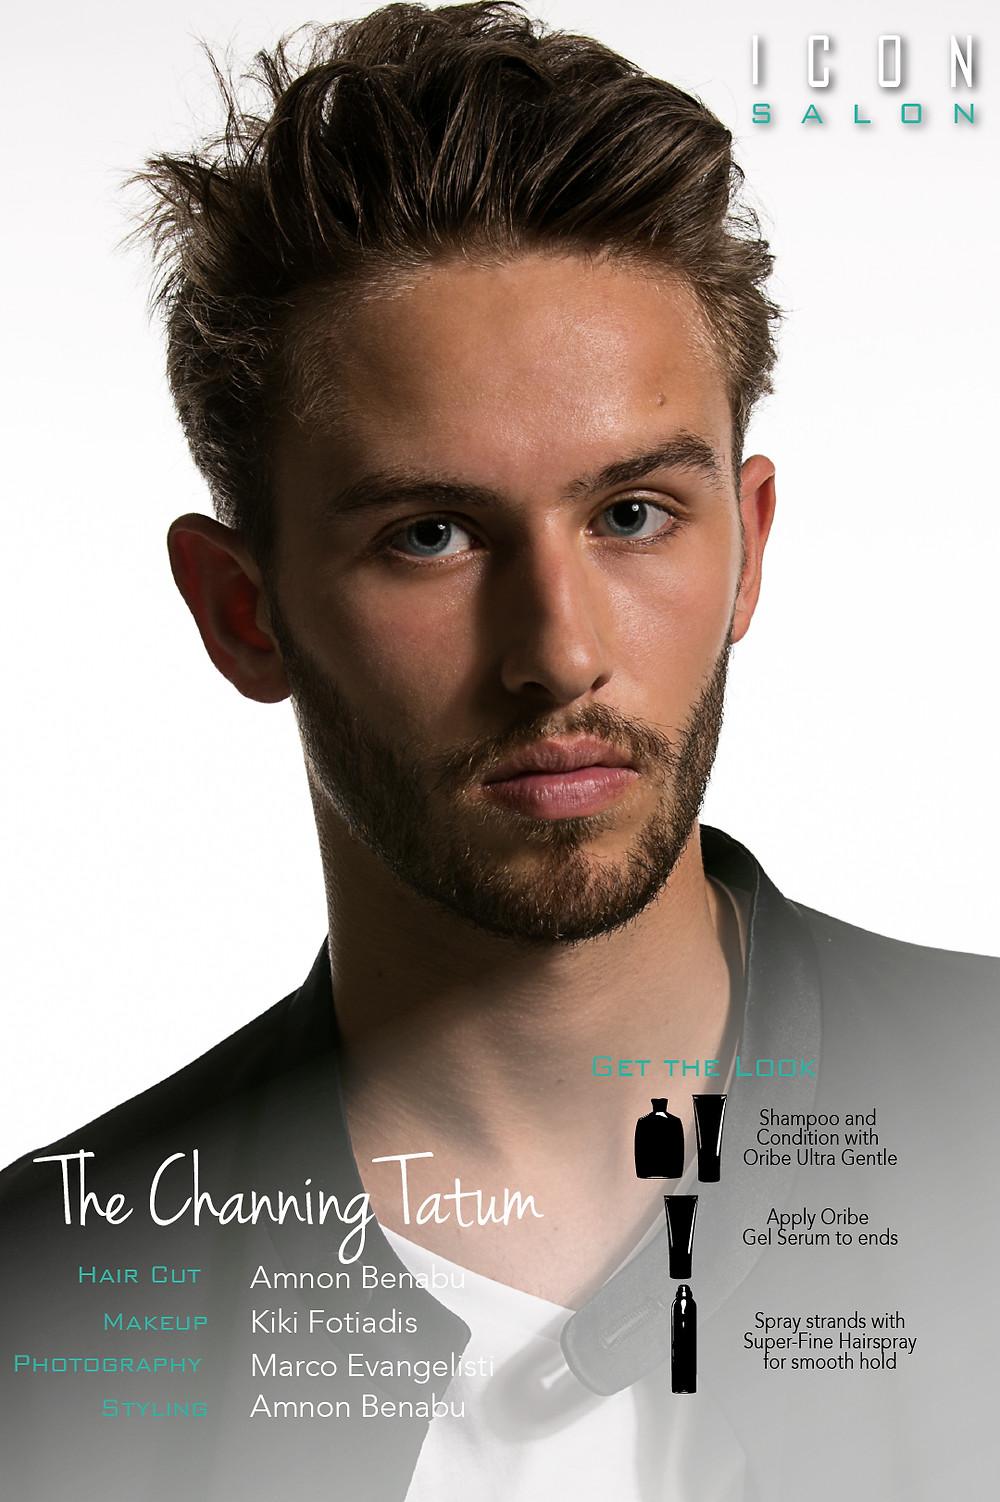 Channing-Tatum.jpg